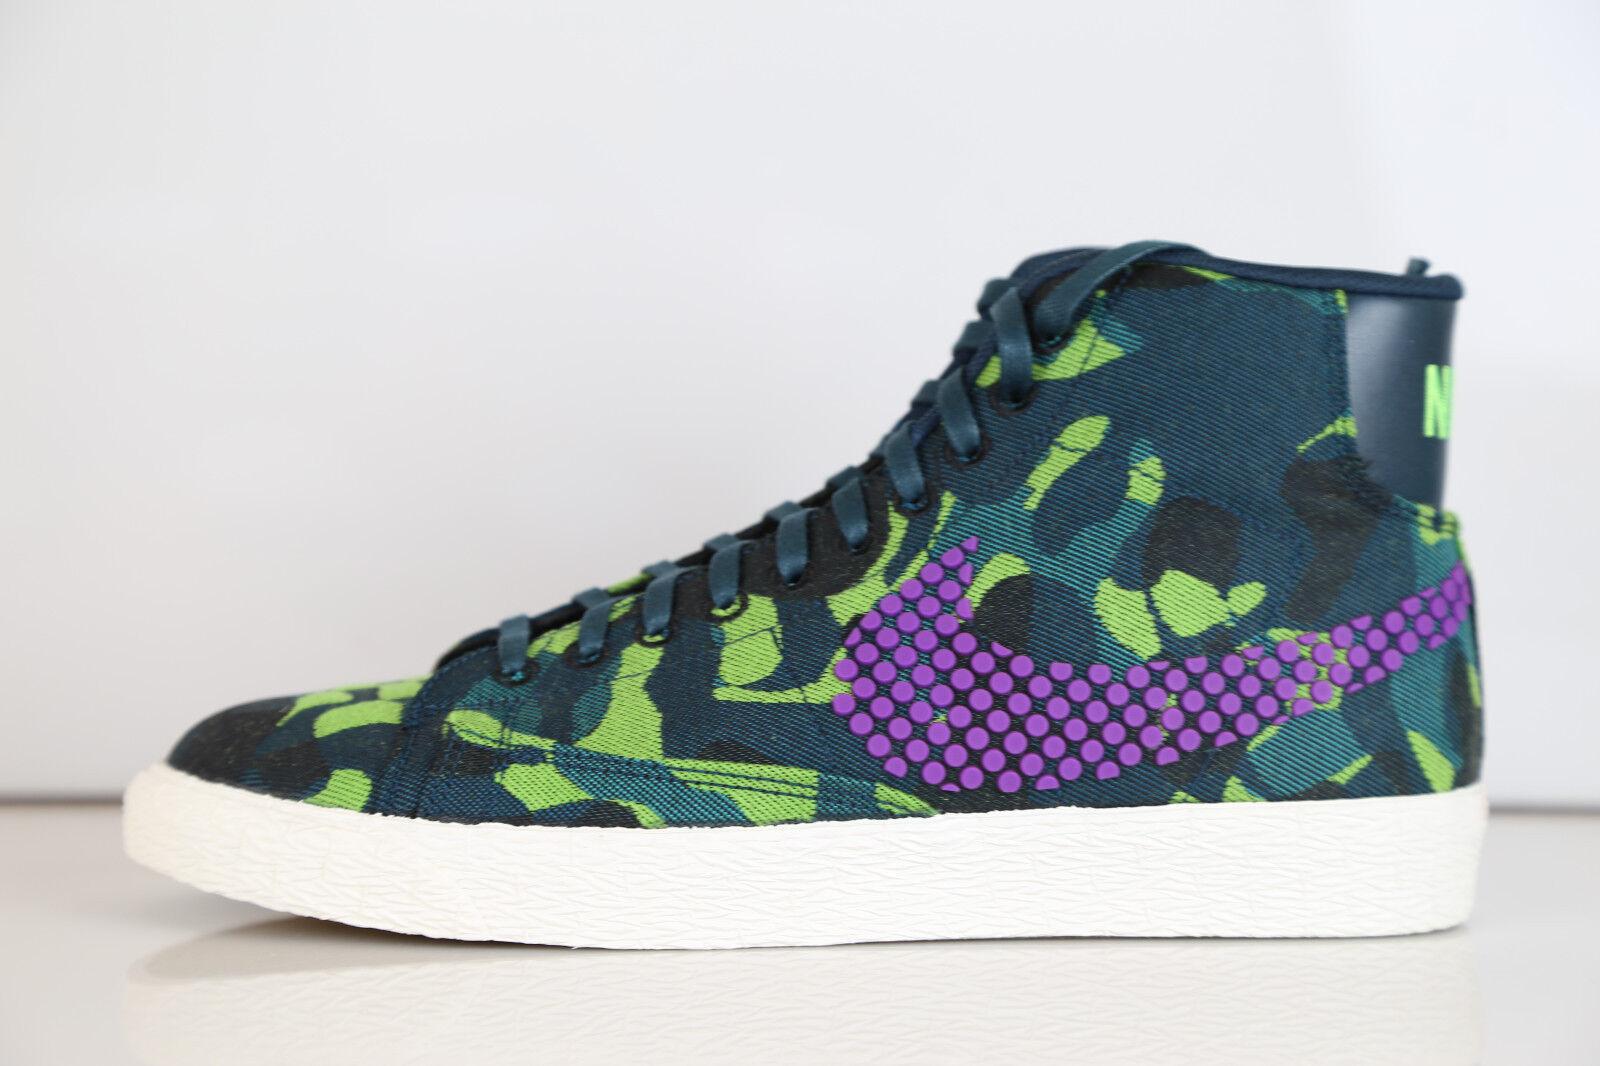 Nike Womens Blazer Mid JCRD PRM Tawny Purple Ghost Ghost Ghost 807382-200 6-9 supreme free 5fc8ef